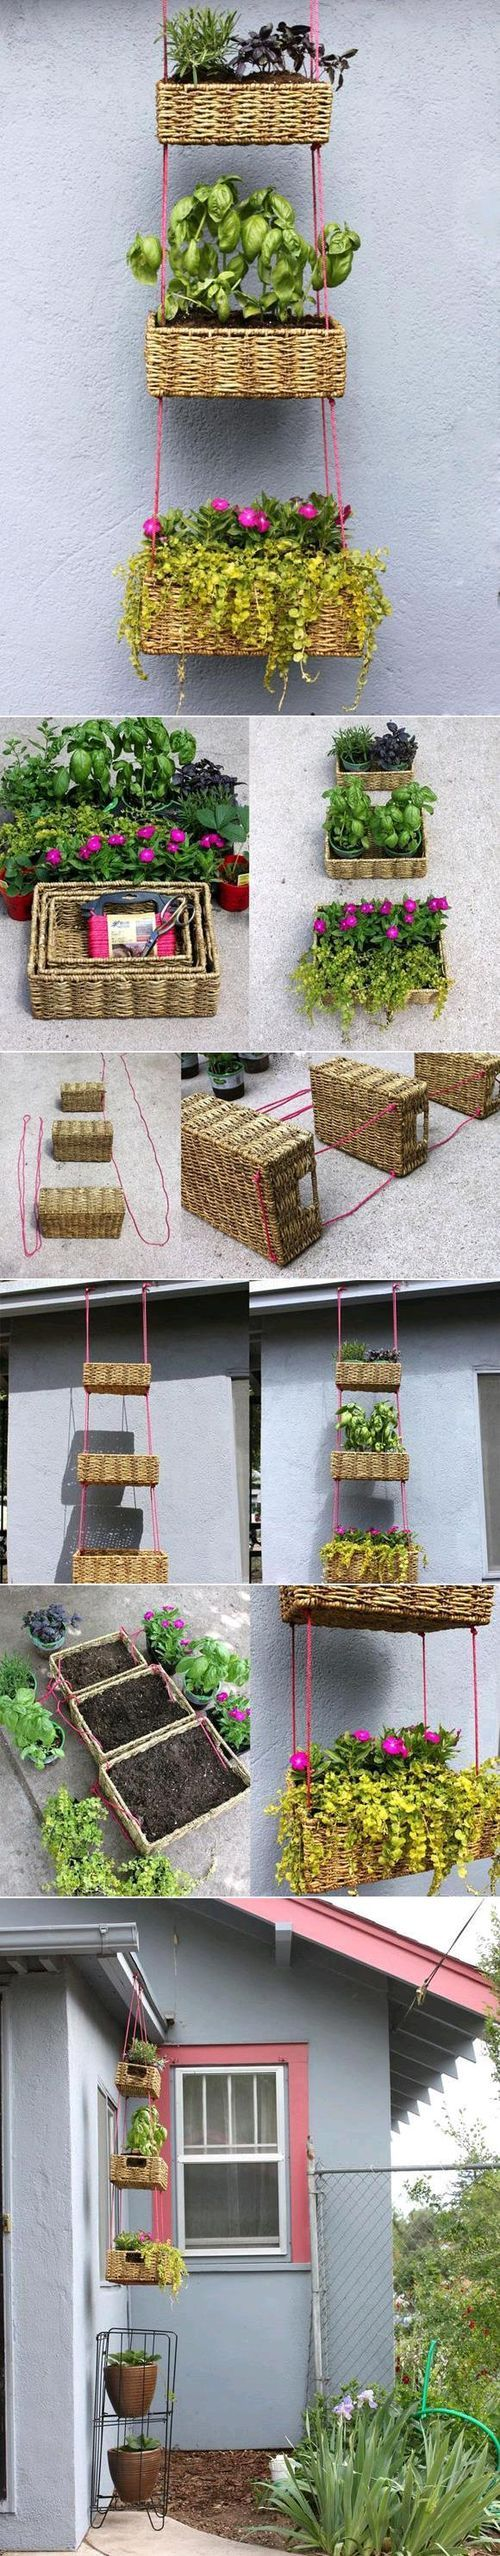 DIY Hanging Basket Flower Pot DIY Projects / UsefulDIY.com